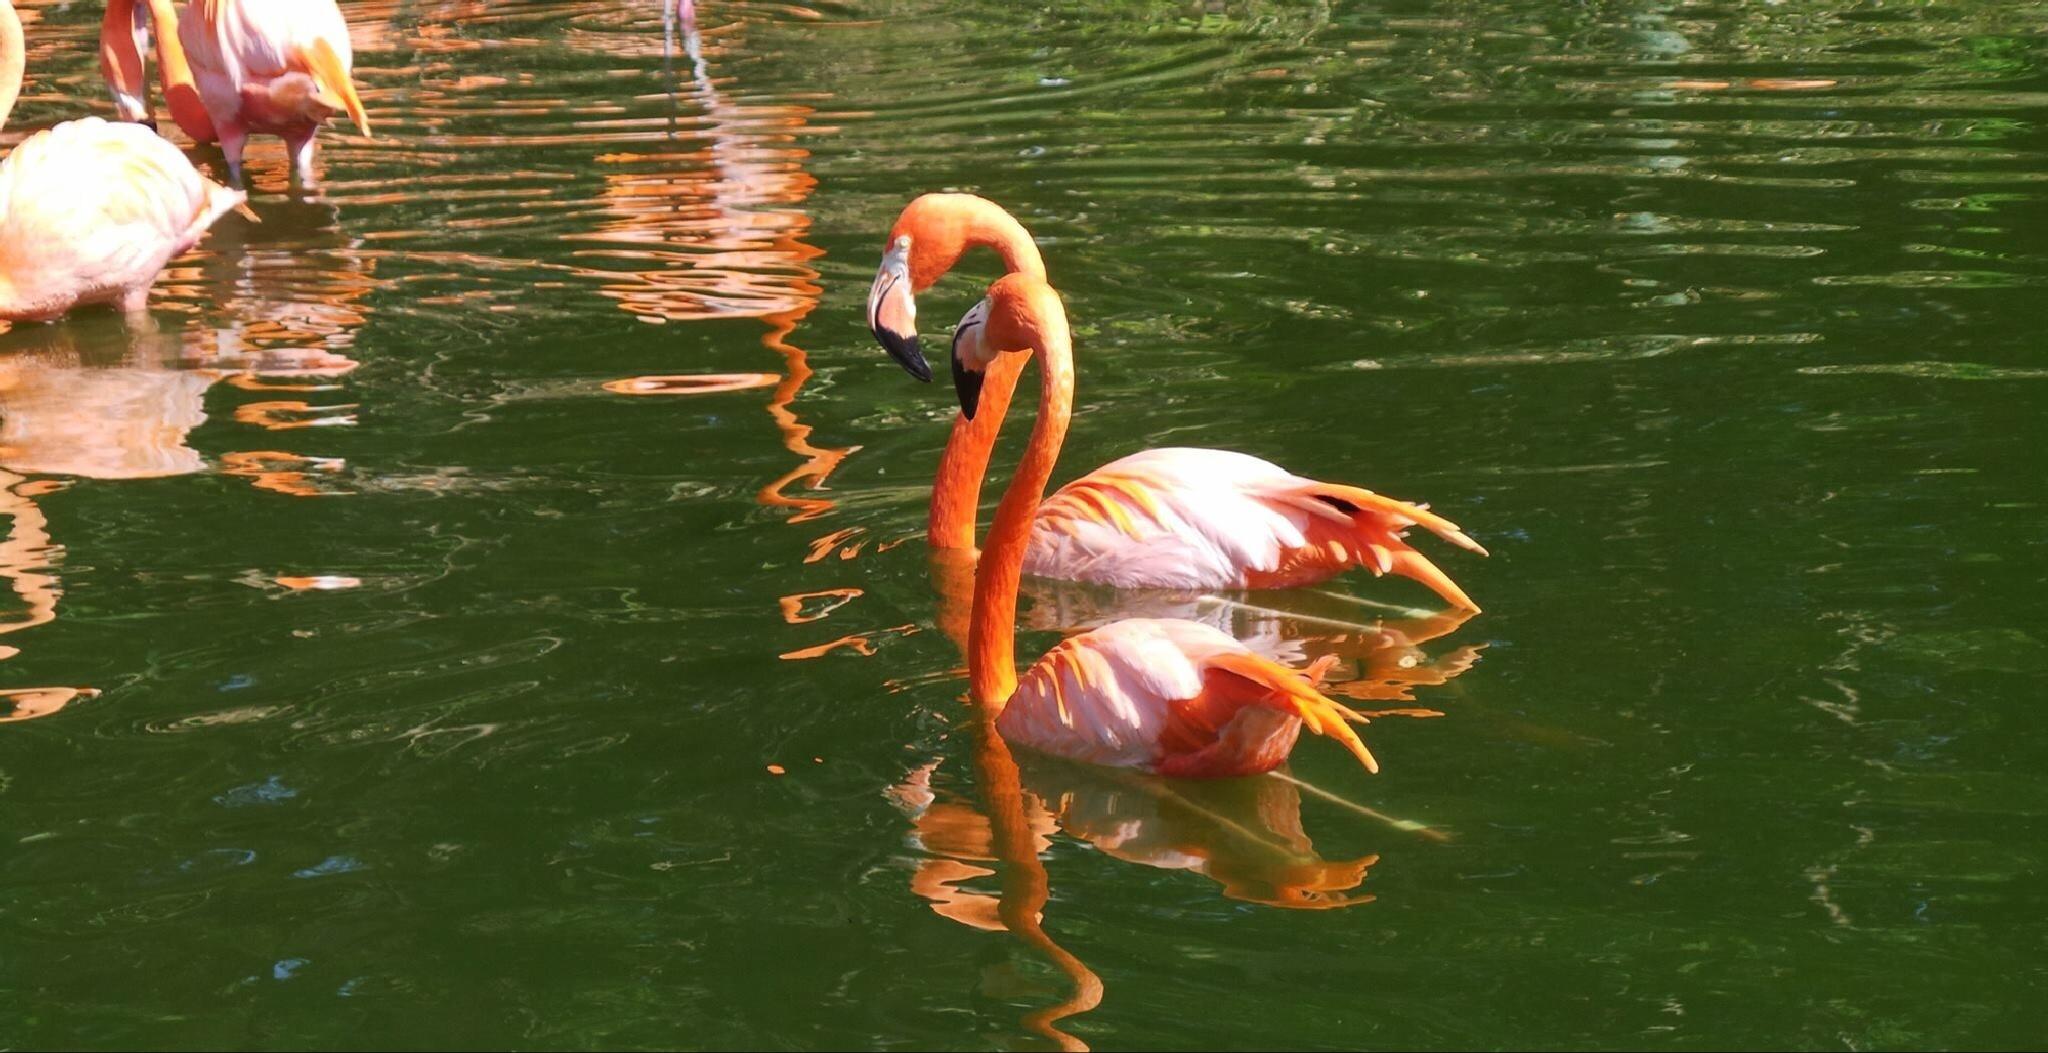 Green and Orange by Shabana